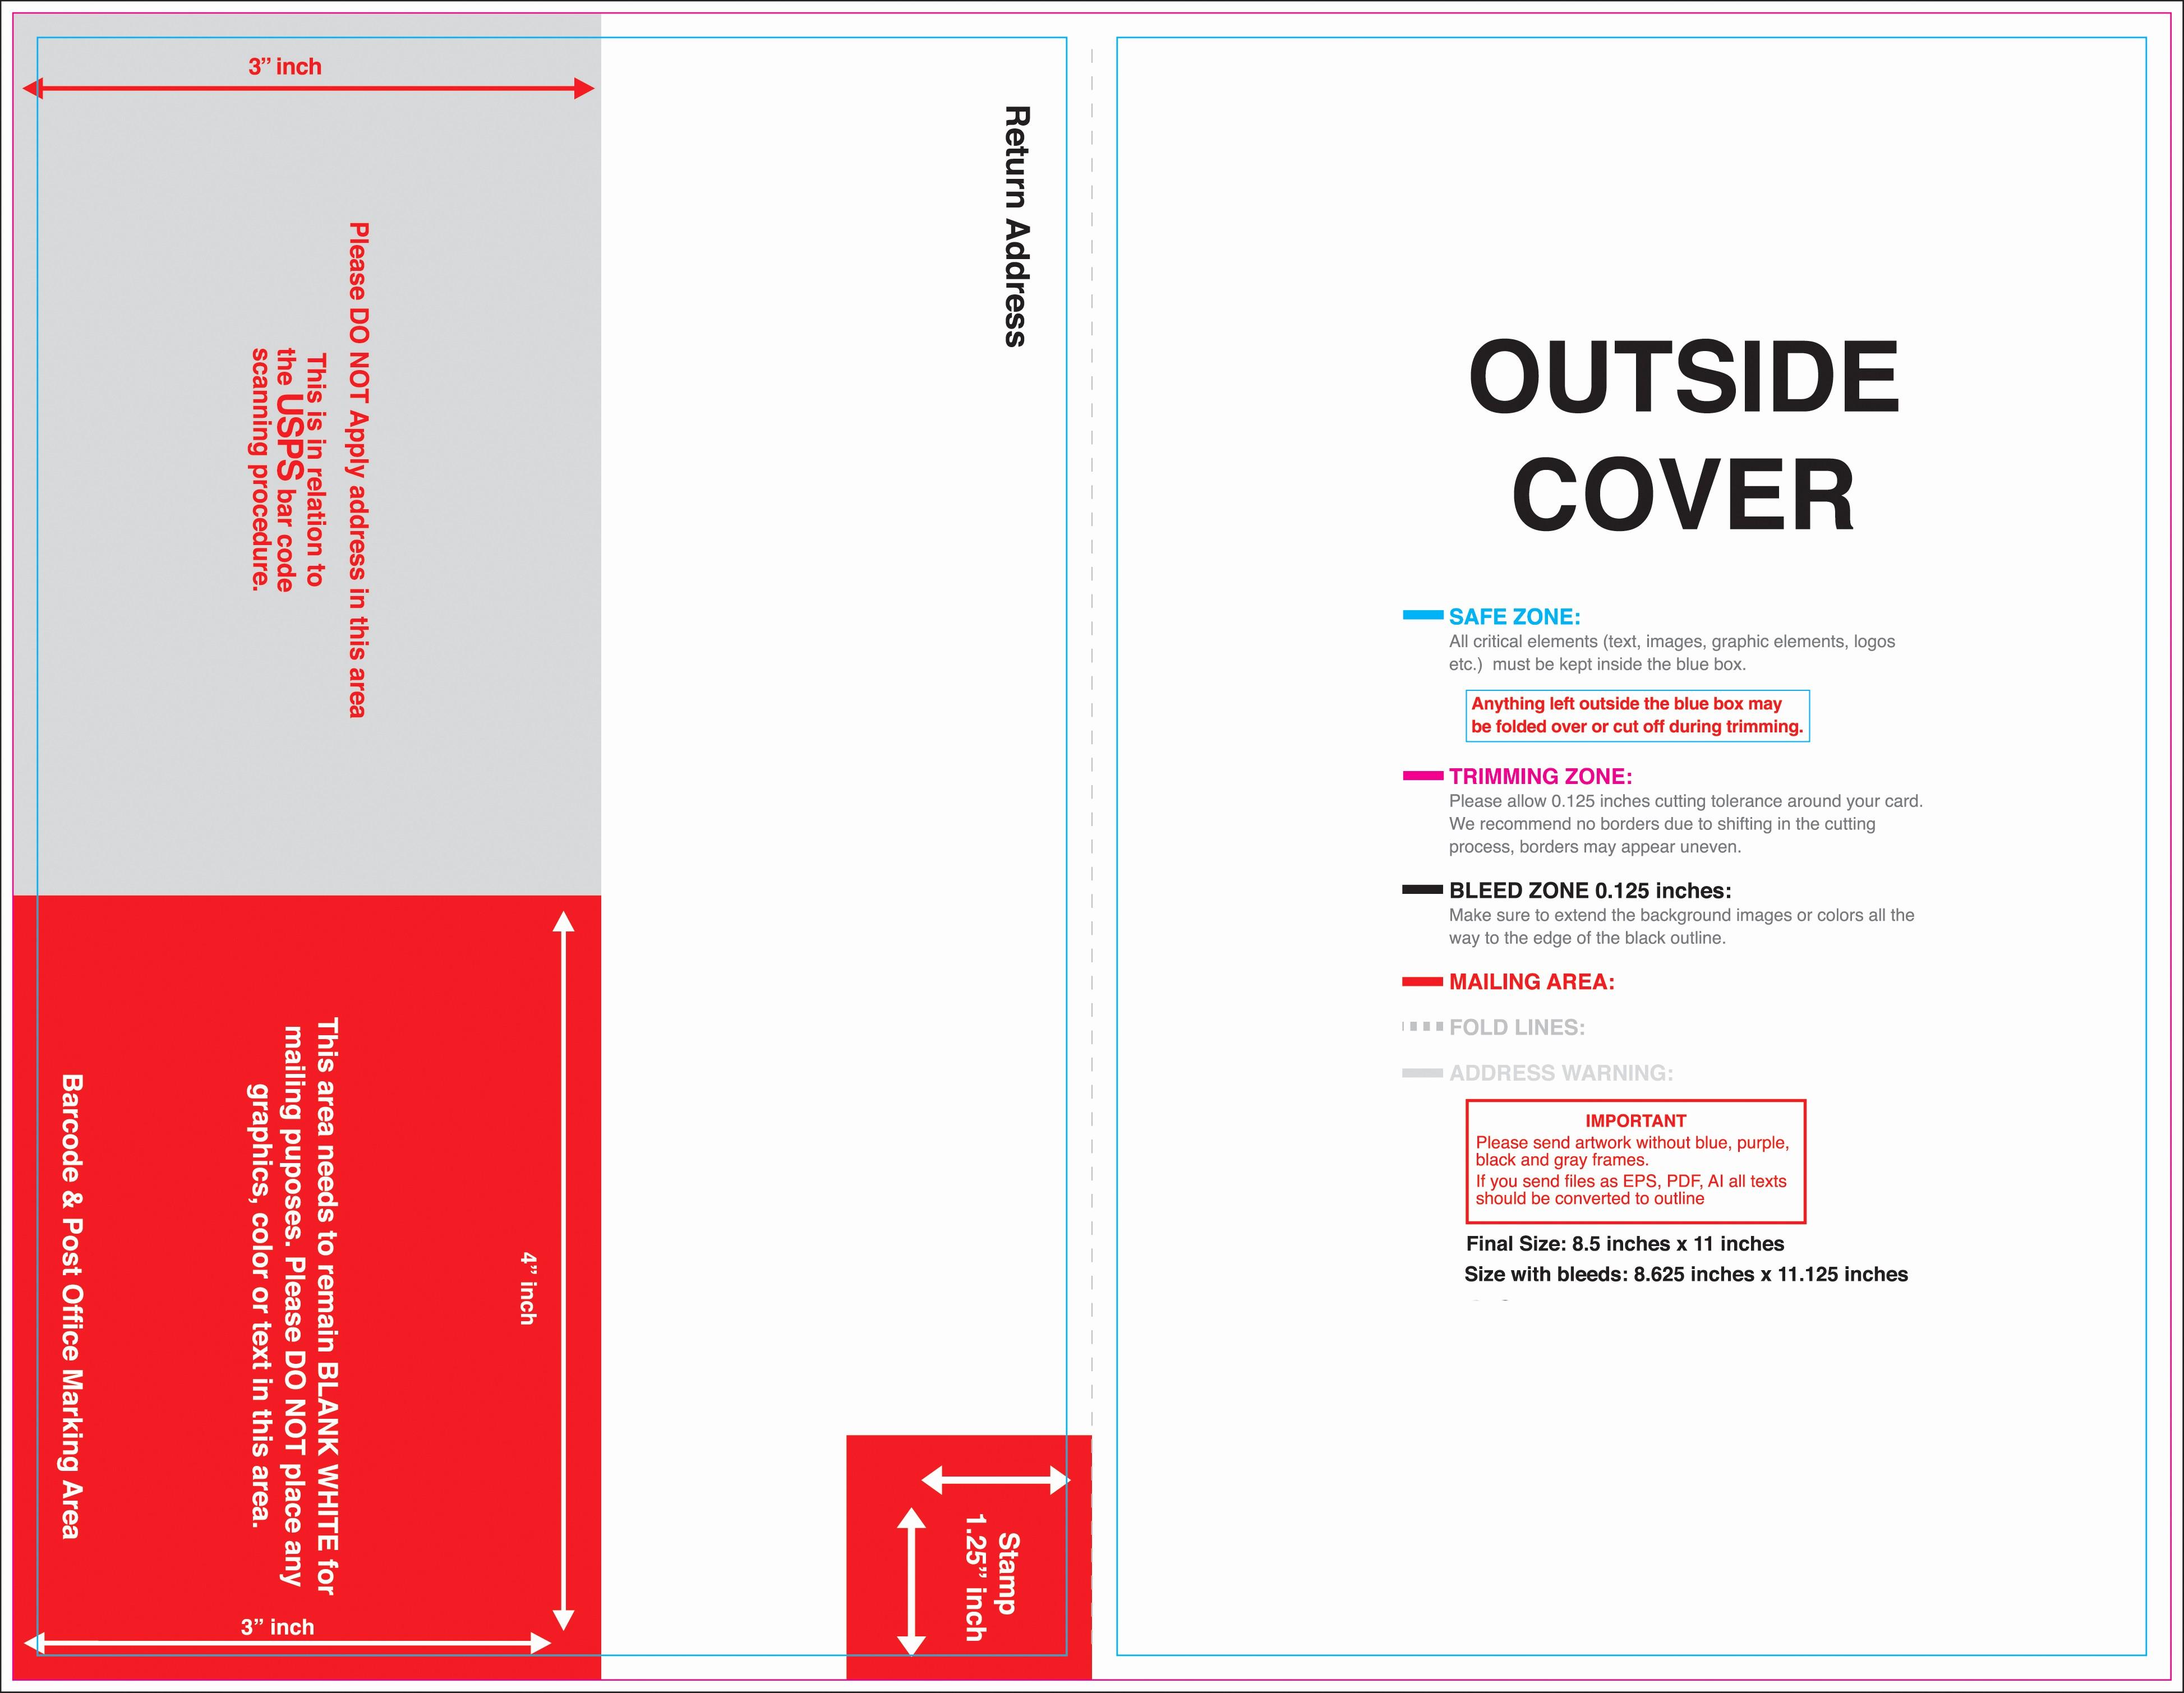 Half-fold Brochure Template Elegant 10 Best Of Two Fold Brochure Template Half Fold